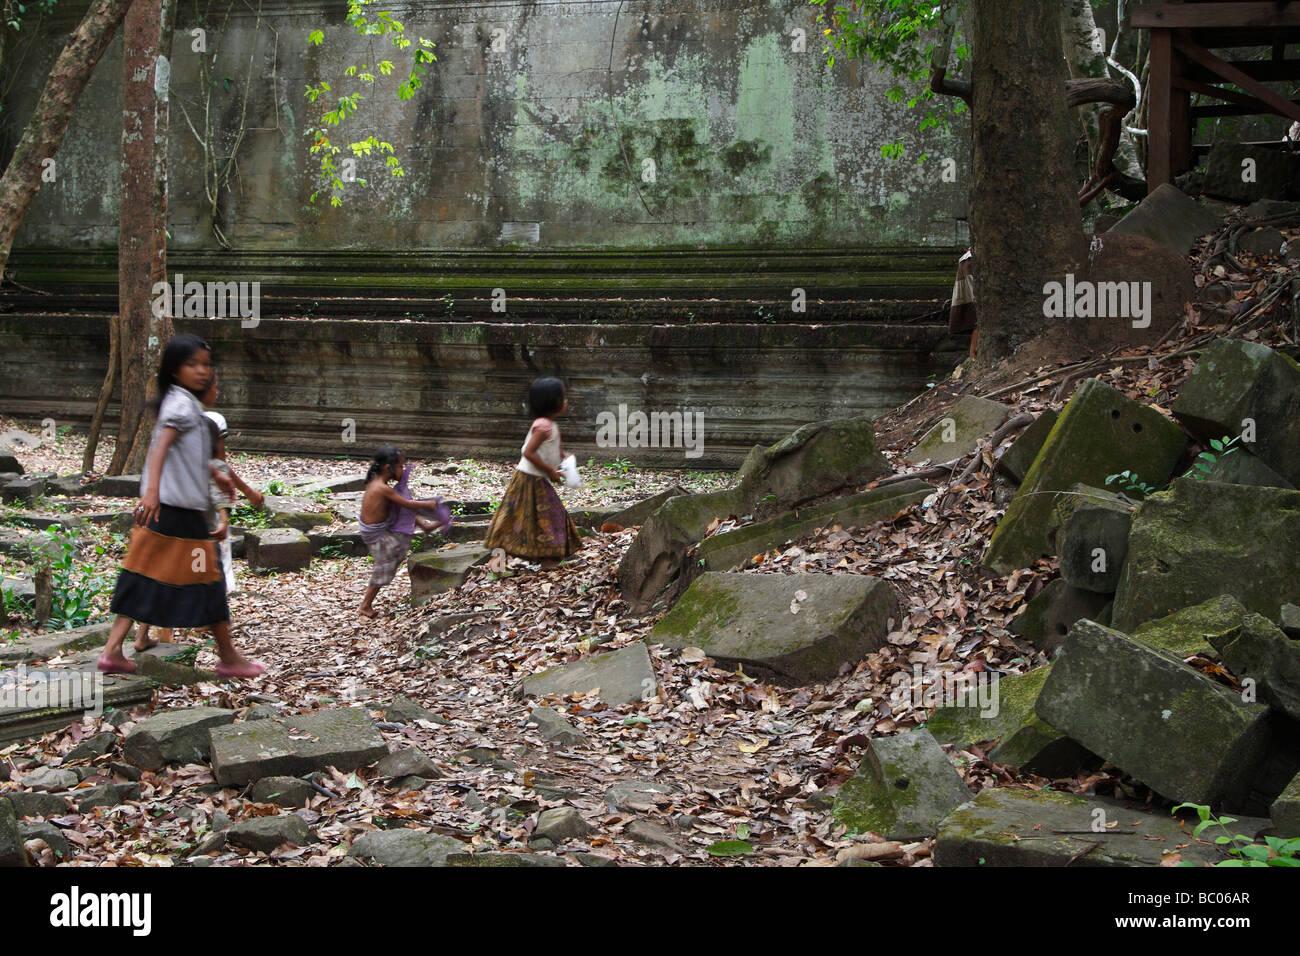 Ninos Jugando En Camboya Antigua Selva Ruinas De Beng Mealea